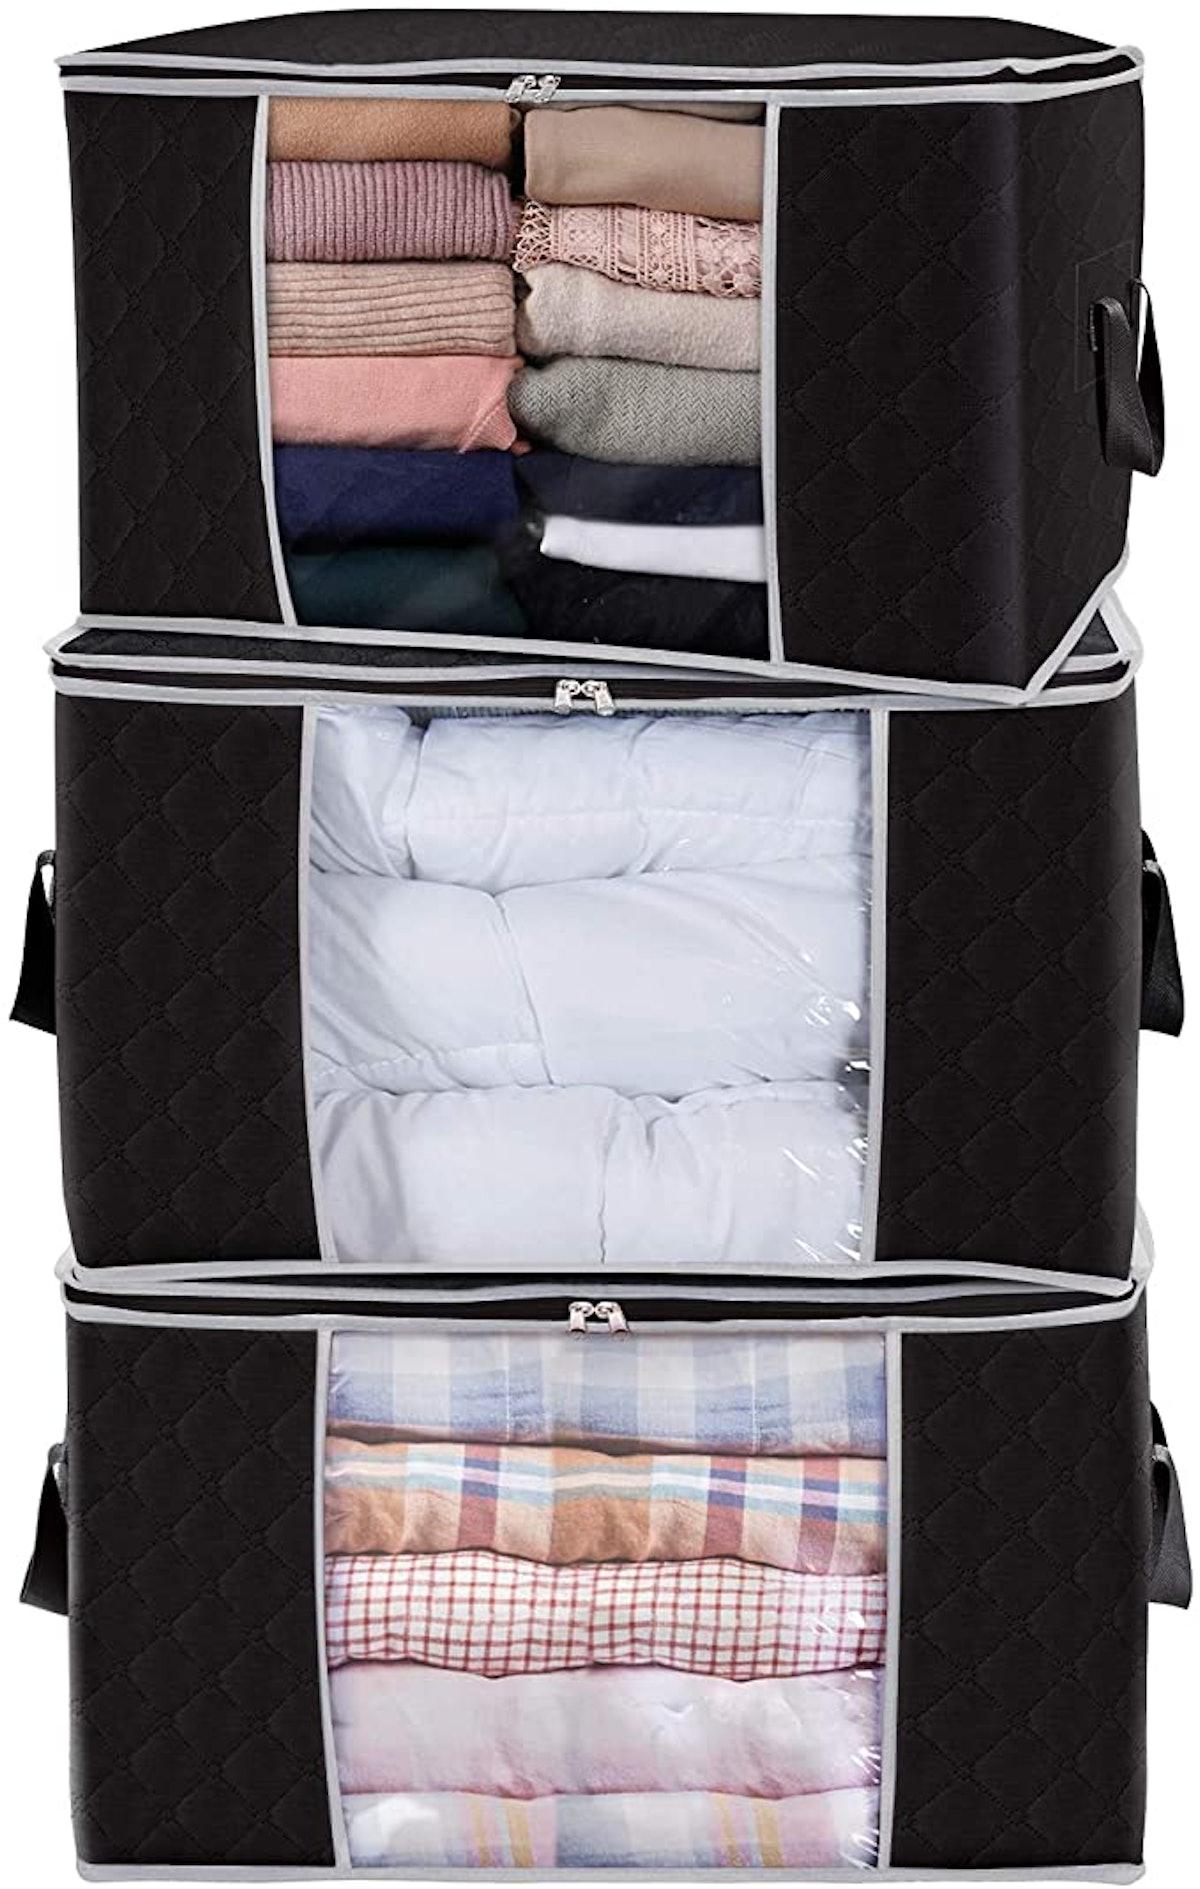 Lifewit Large Capacity Clothes Storage Bag (3-Pack)